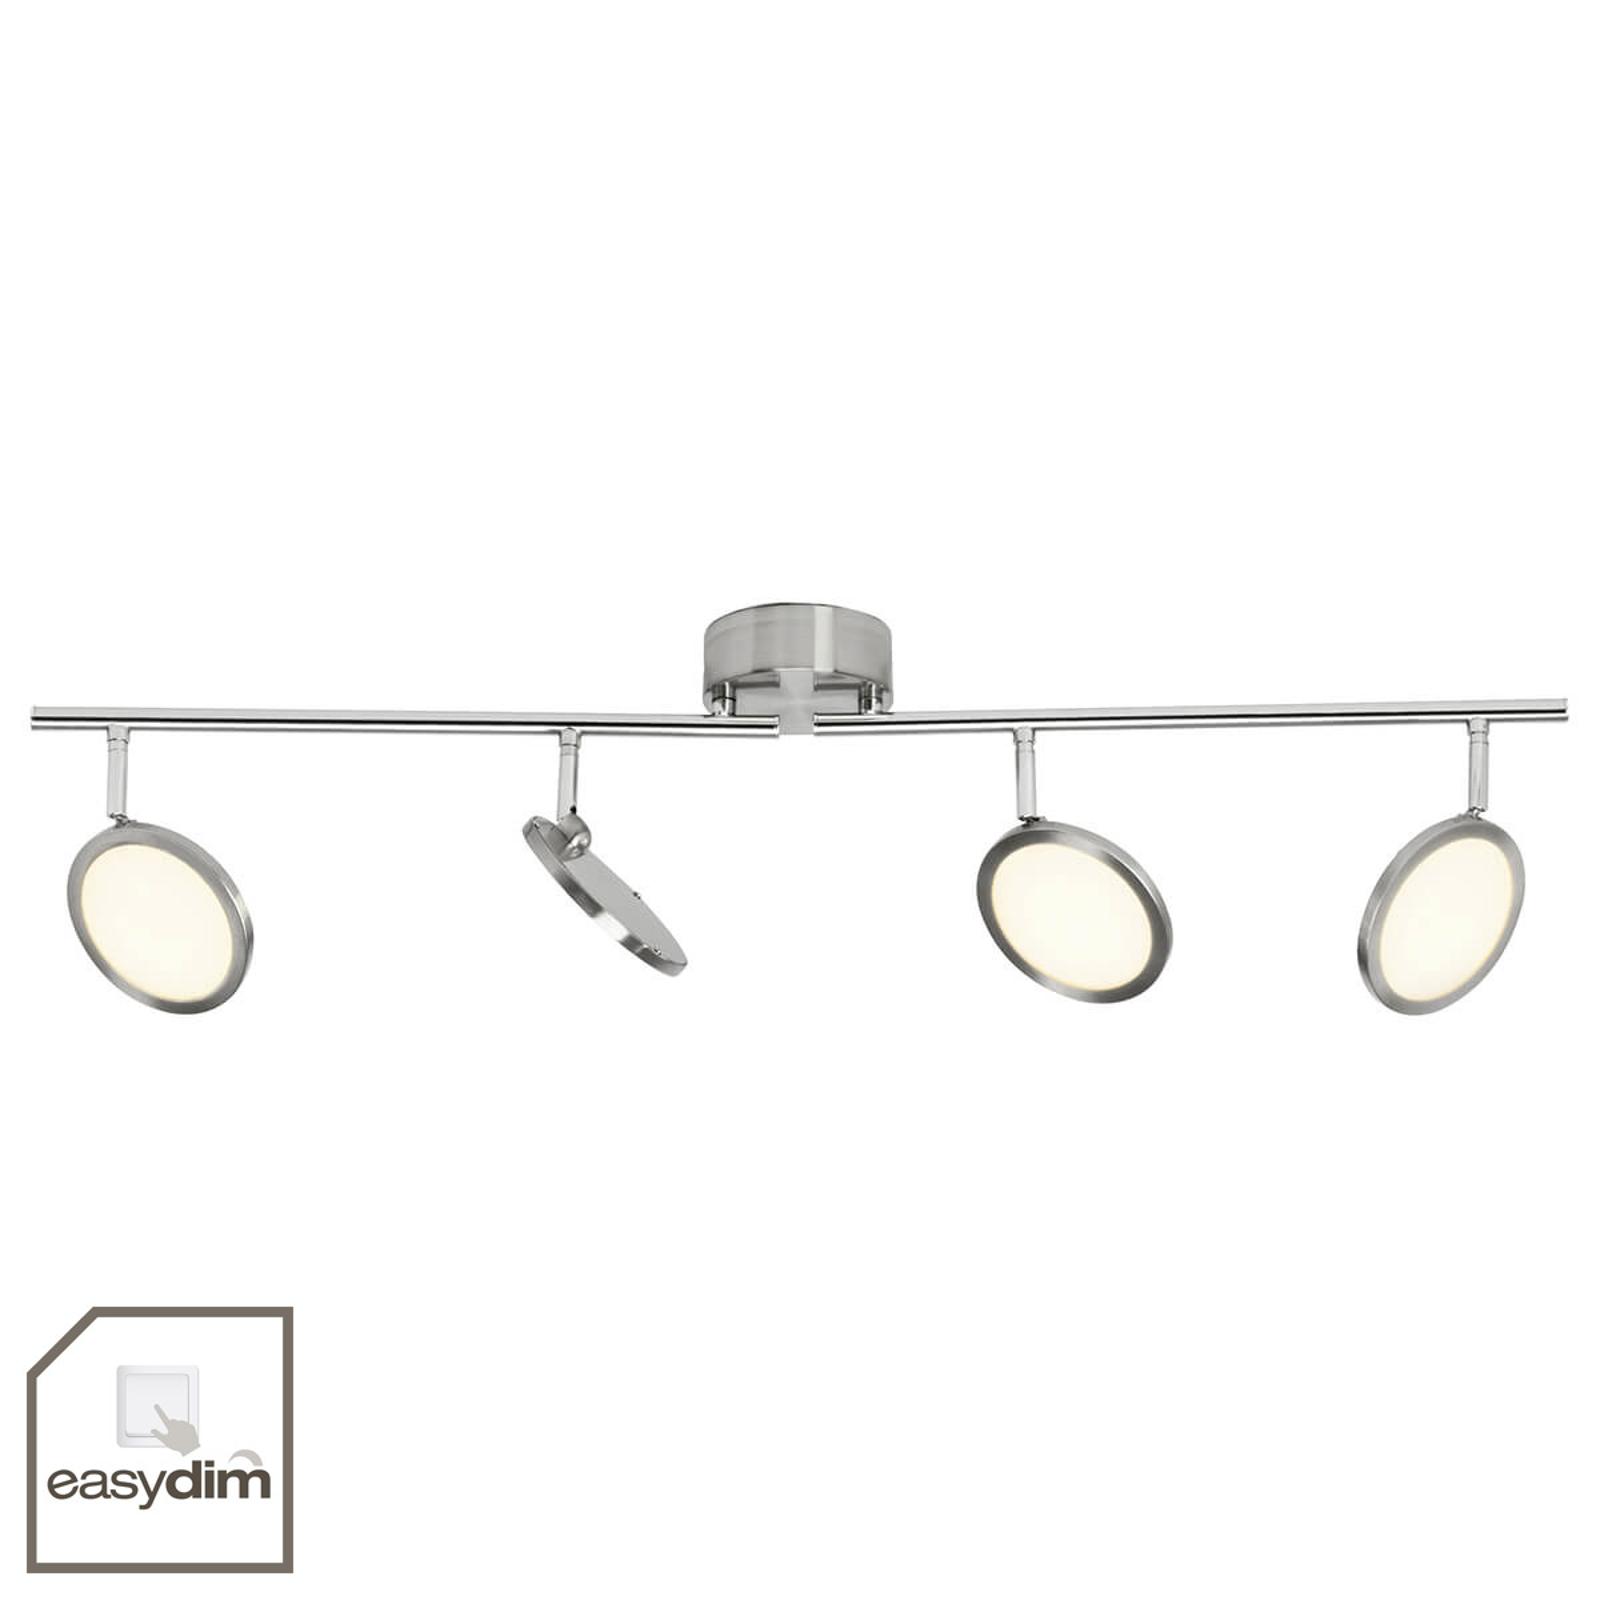 Dimbare LED plafondlamp Pluto, 4-lamps